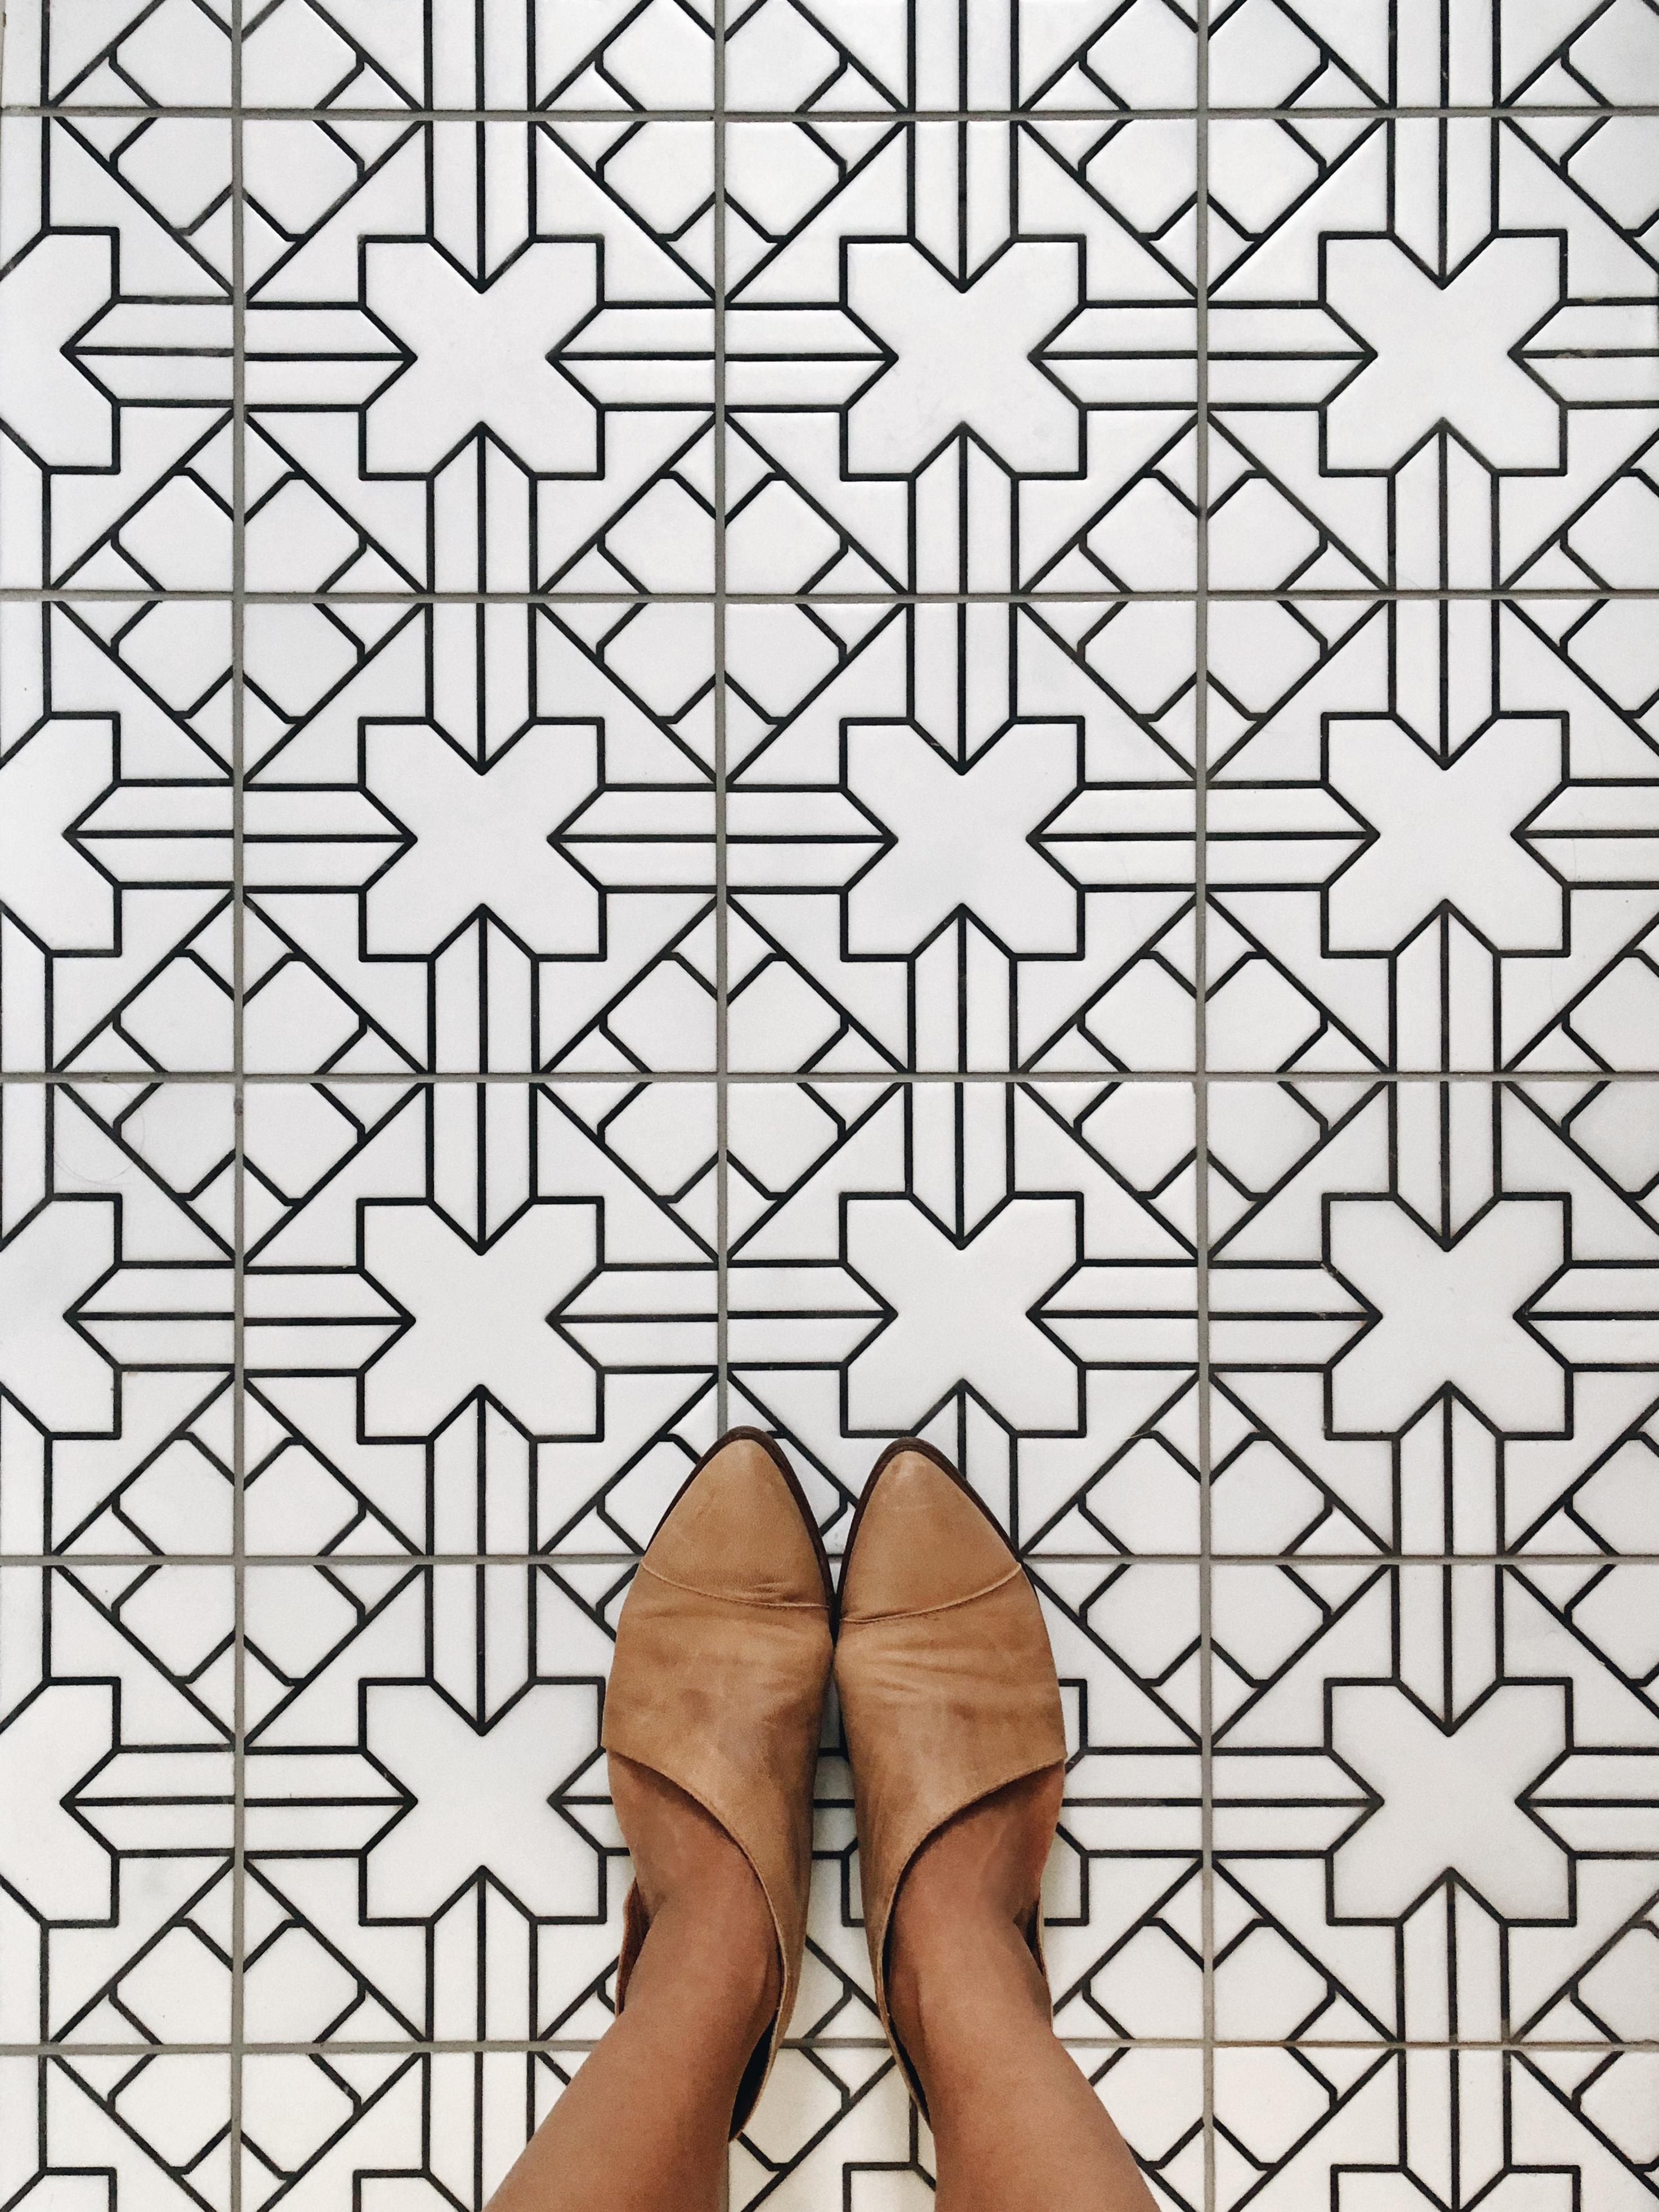 2018_Q4_image_hi_res_full-rights_influencer_Patti_Wagner_bathroom_floor_handpainted_tile_kasbah_neutral_motif_with_feet_detail_FC-232655.jpg?mtime=20190220143704#asset:437965